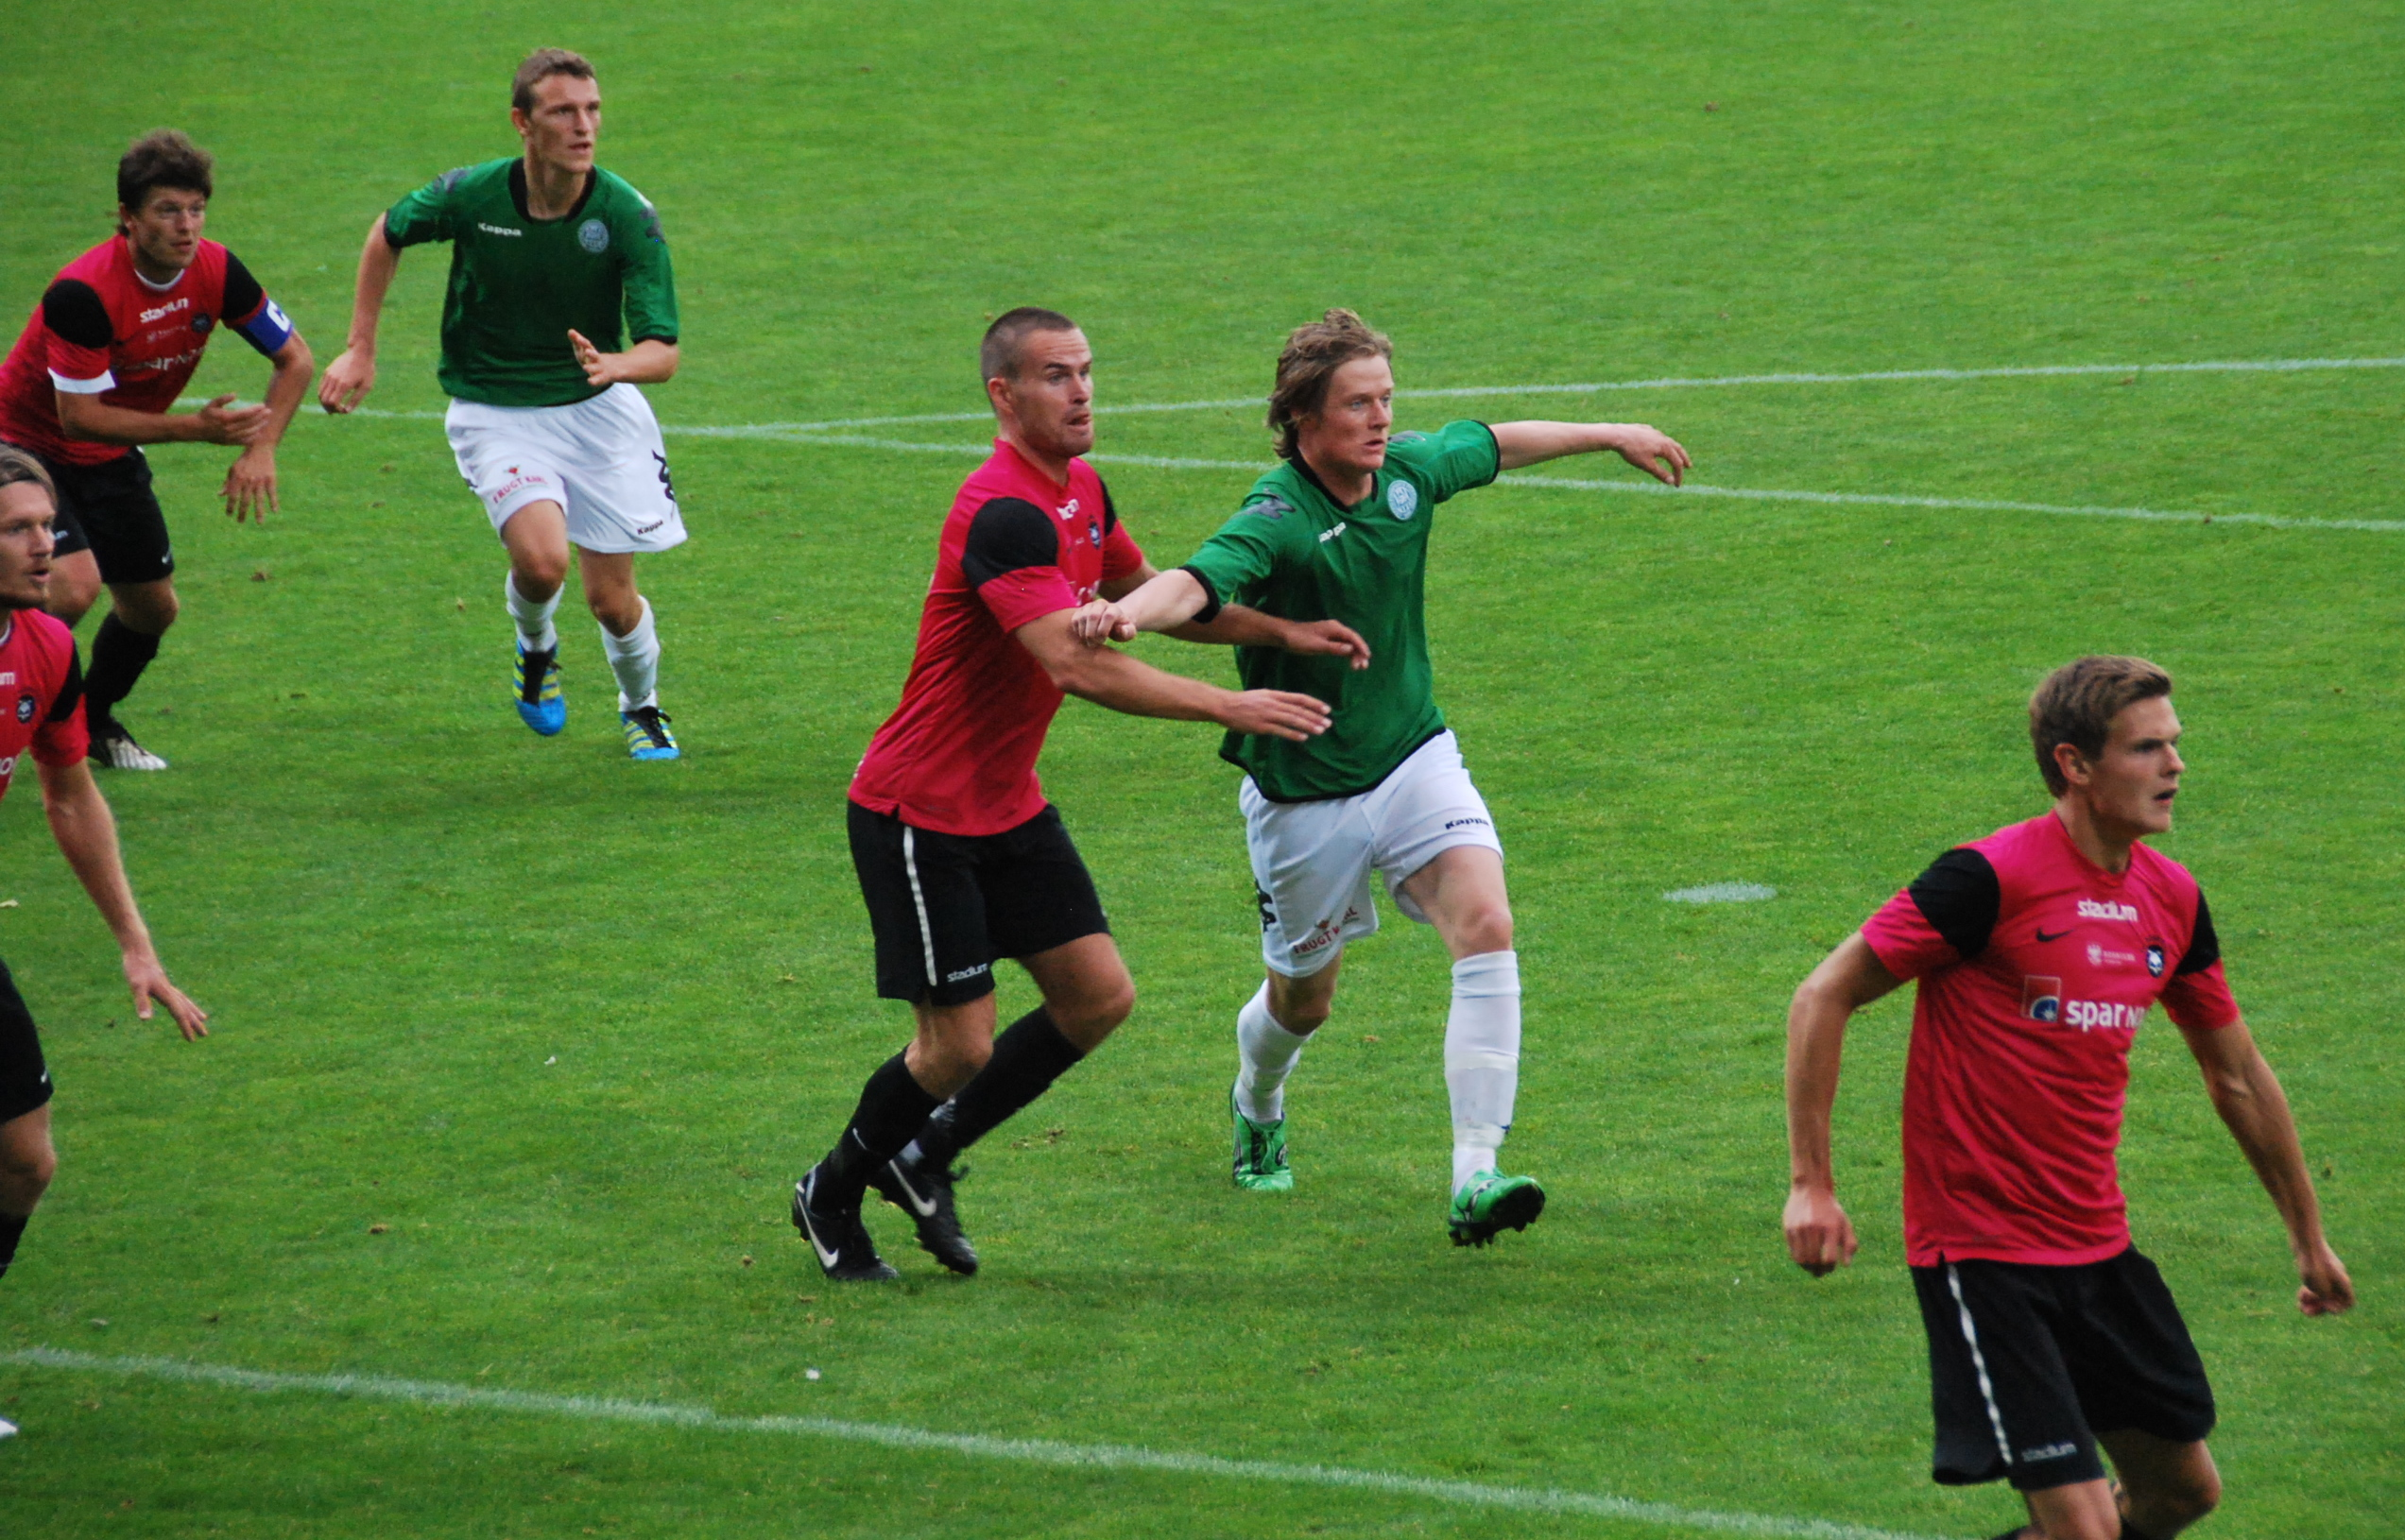 FC Roskilde - Wikipedia, den frie encyklopædi